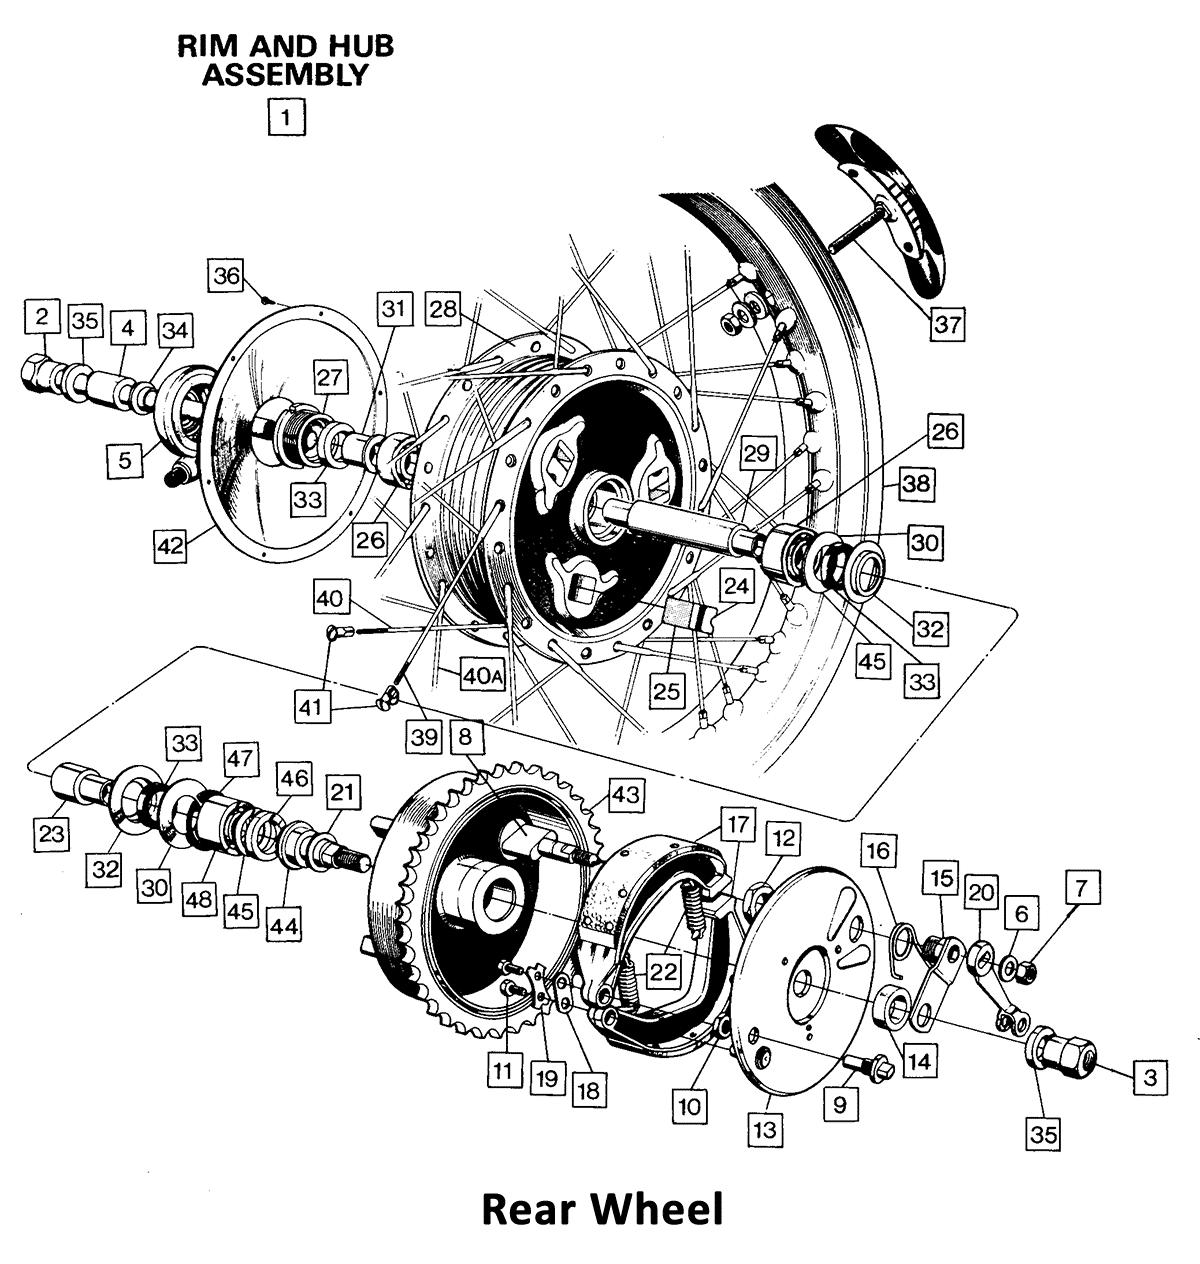 1971 Norton Commando 750 Rear Wheel, classic motorbike spares, classic motorbike spare parts, classic motorcycle spares, classic motorcycle spare parts